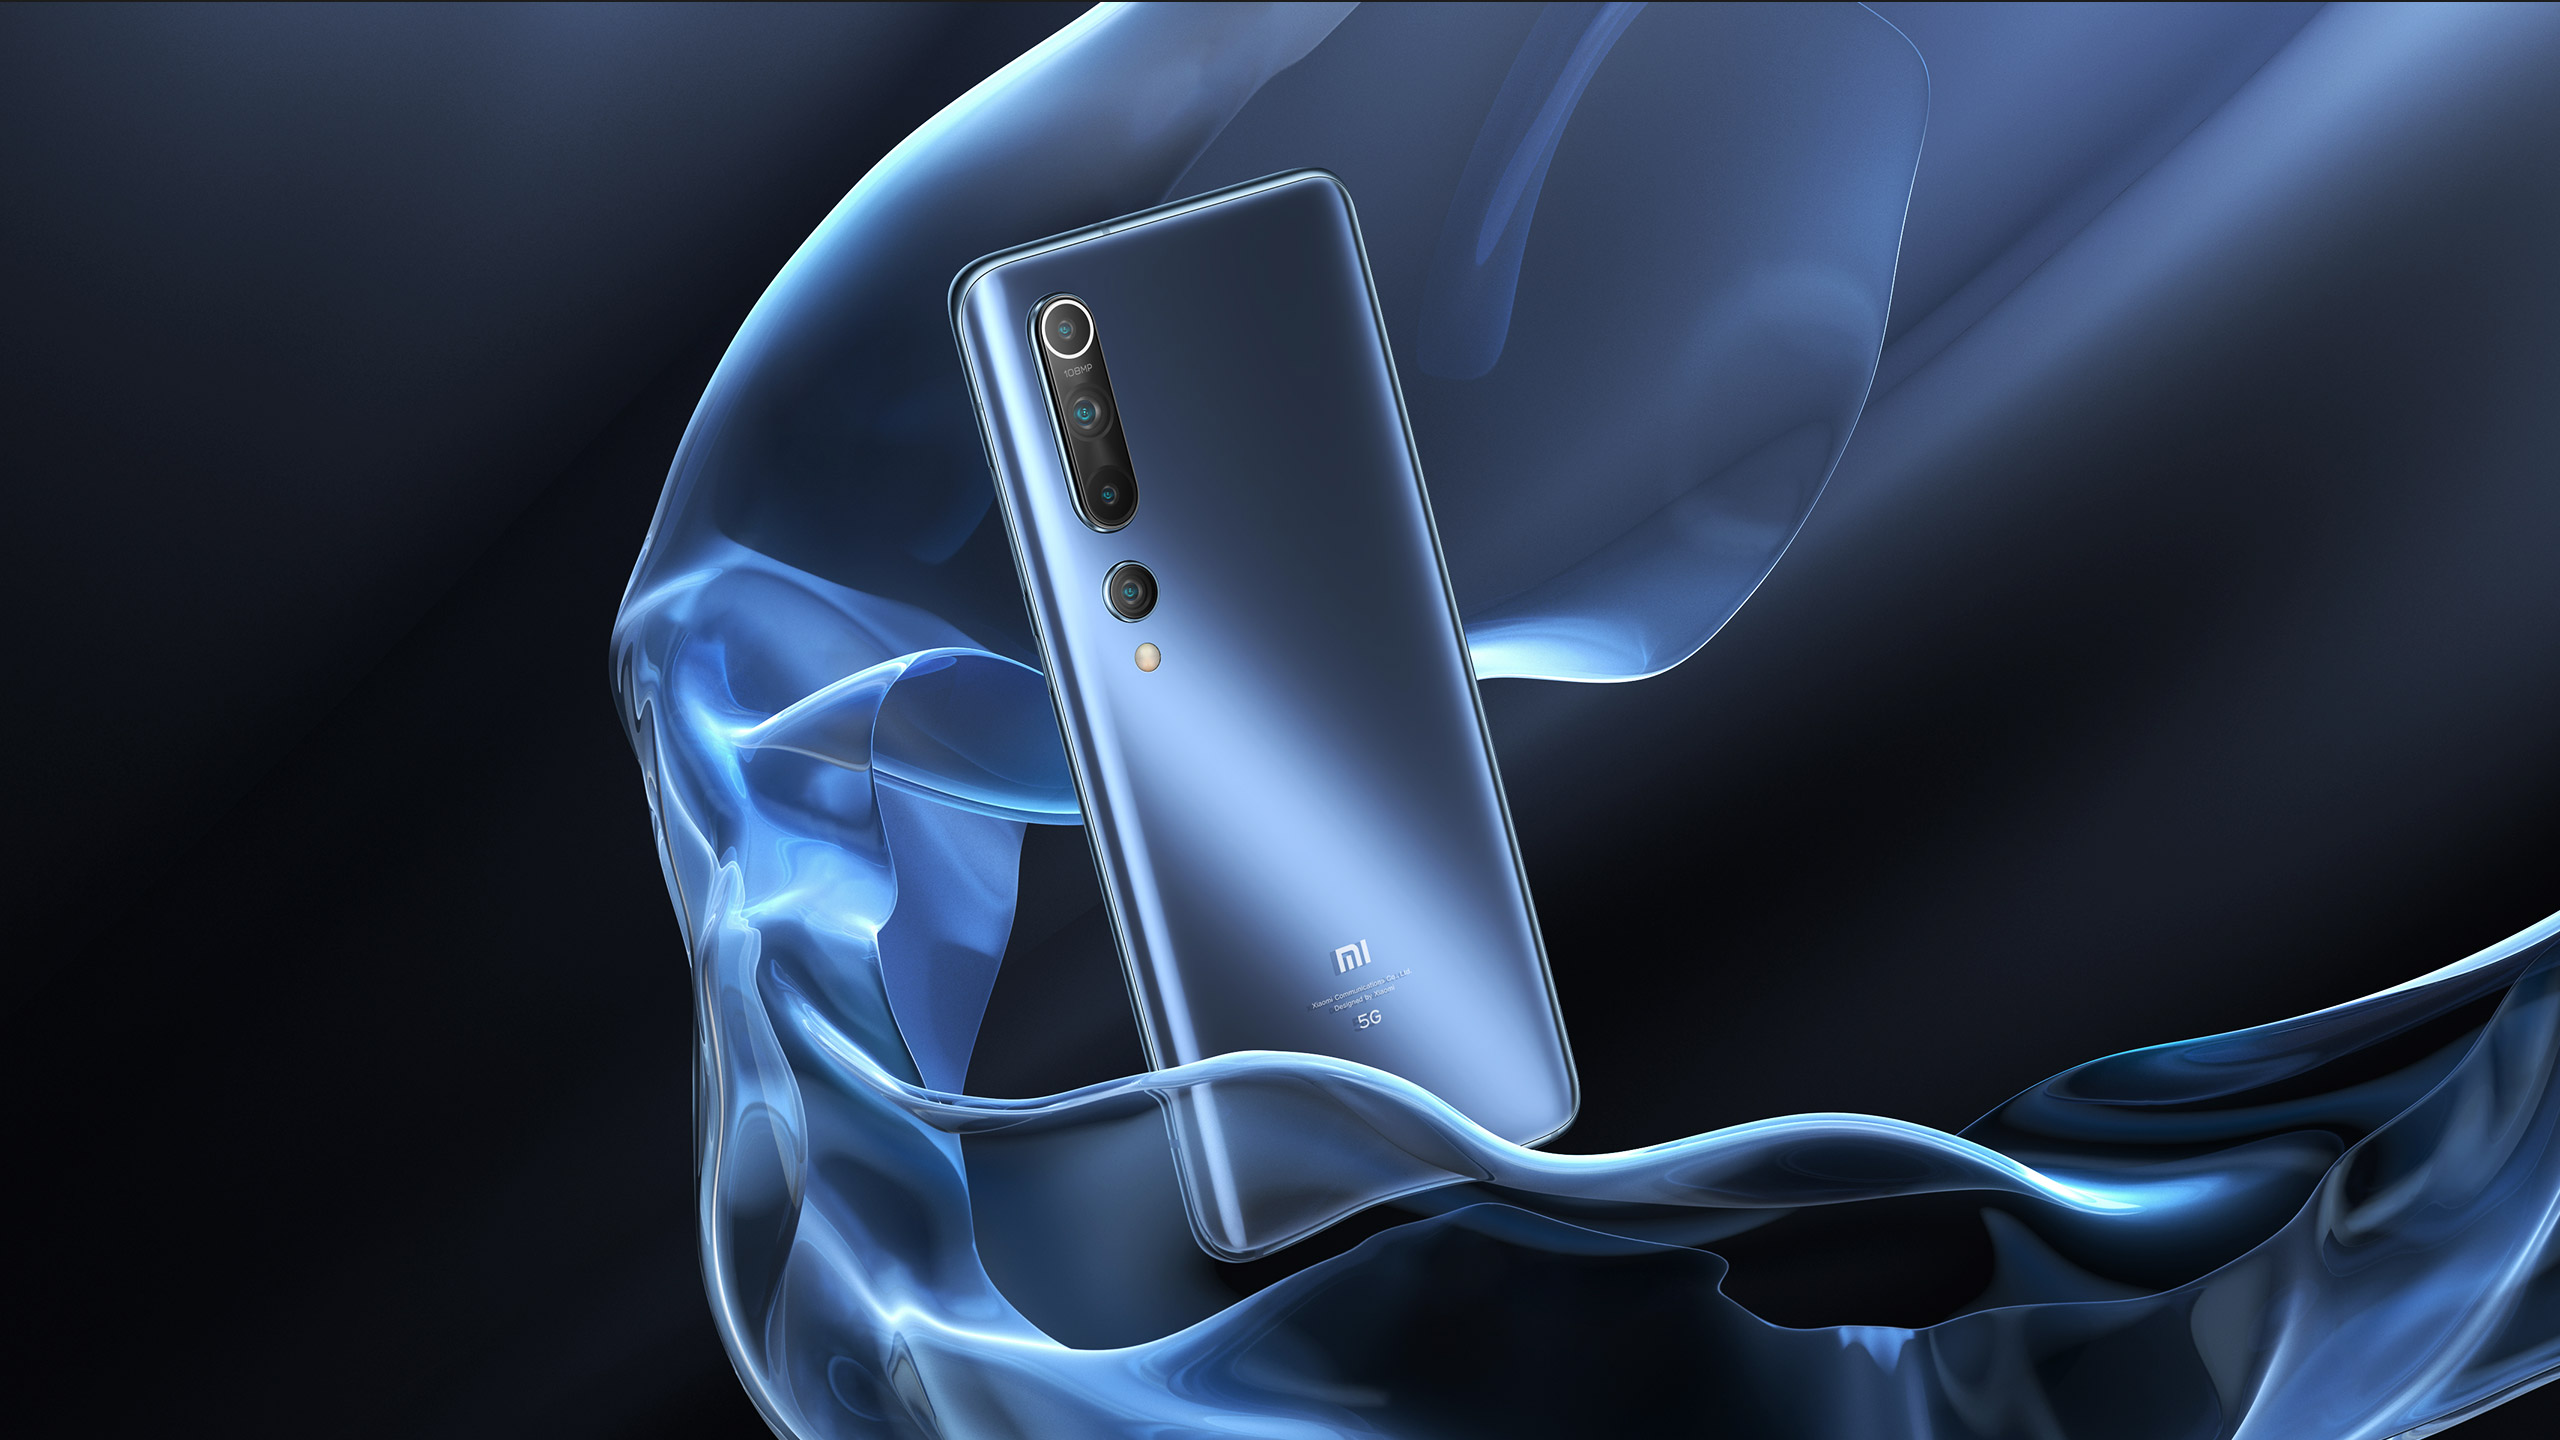 Xiaomi официально представила флагманы Mi 10 и Mi 10 Pro